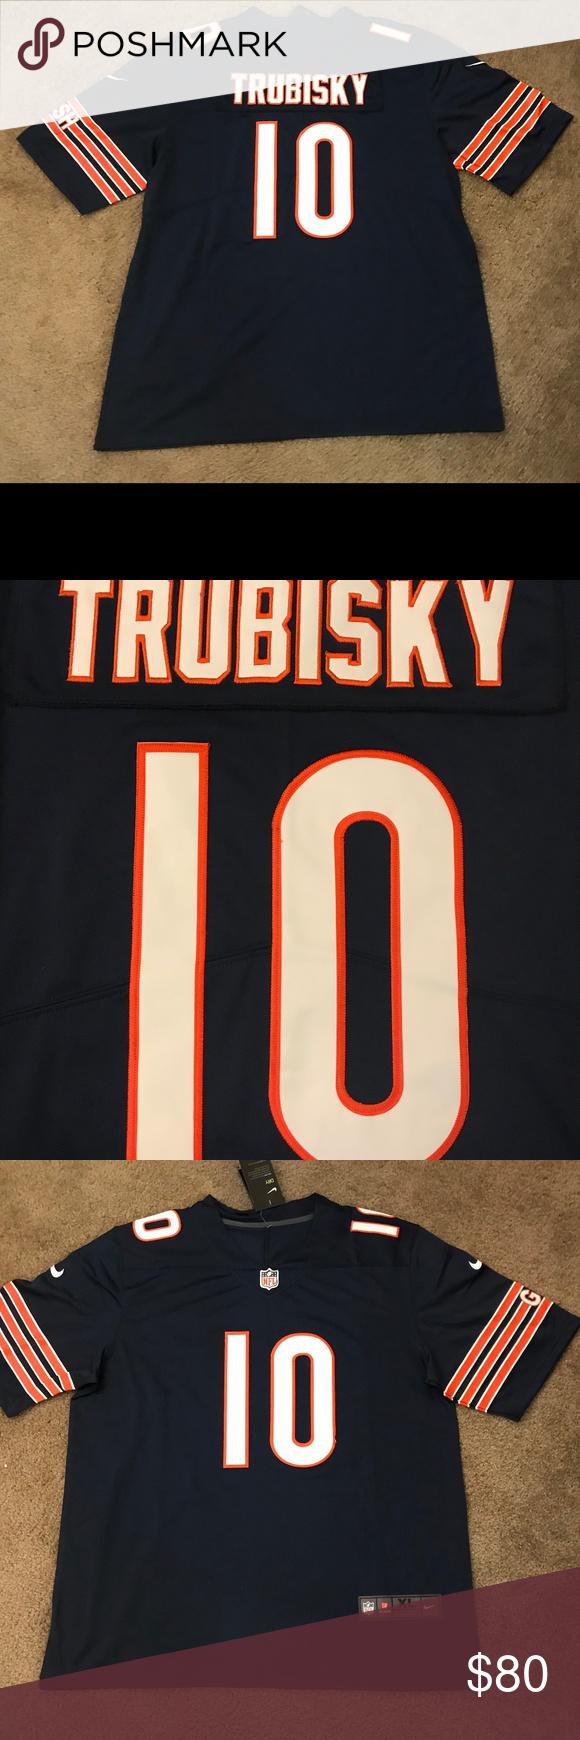 los angeles dfa7e 55b1a Mitch Trubisky Chicago Bears Jersey Men's XL Get your Mitch ...